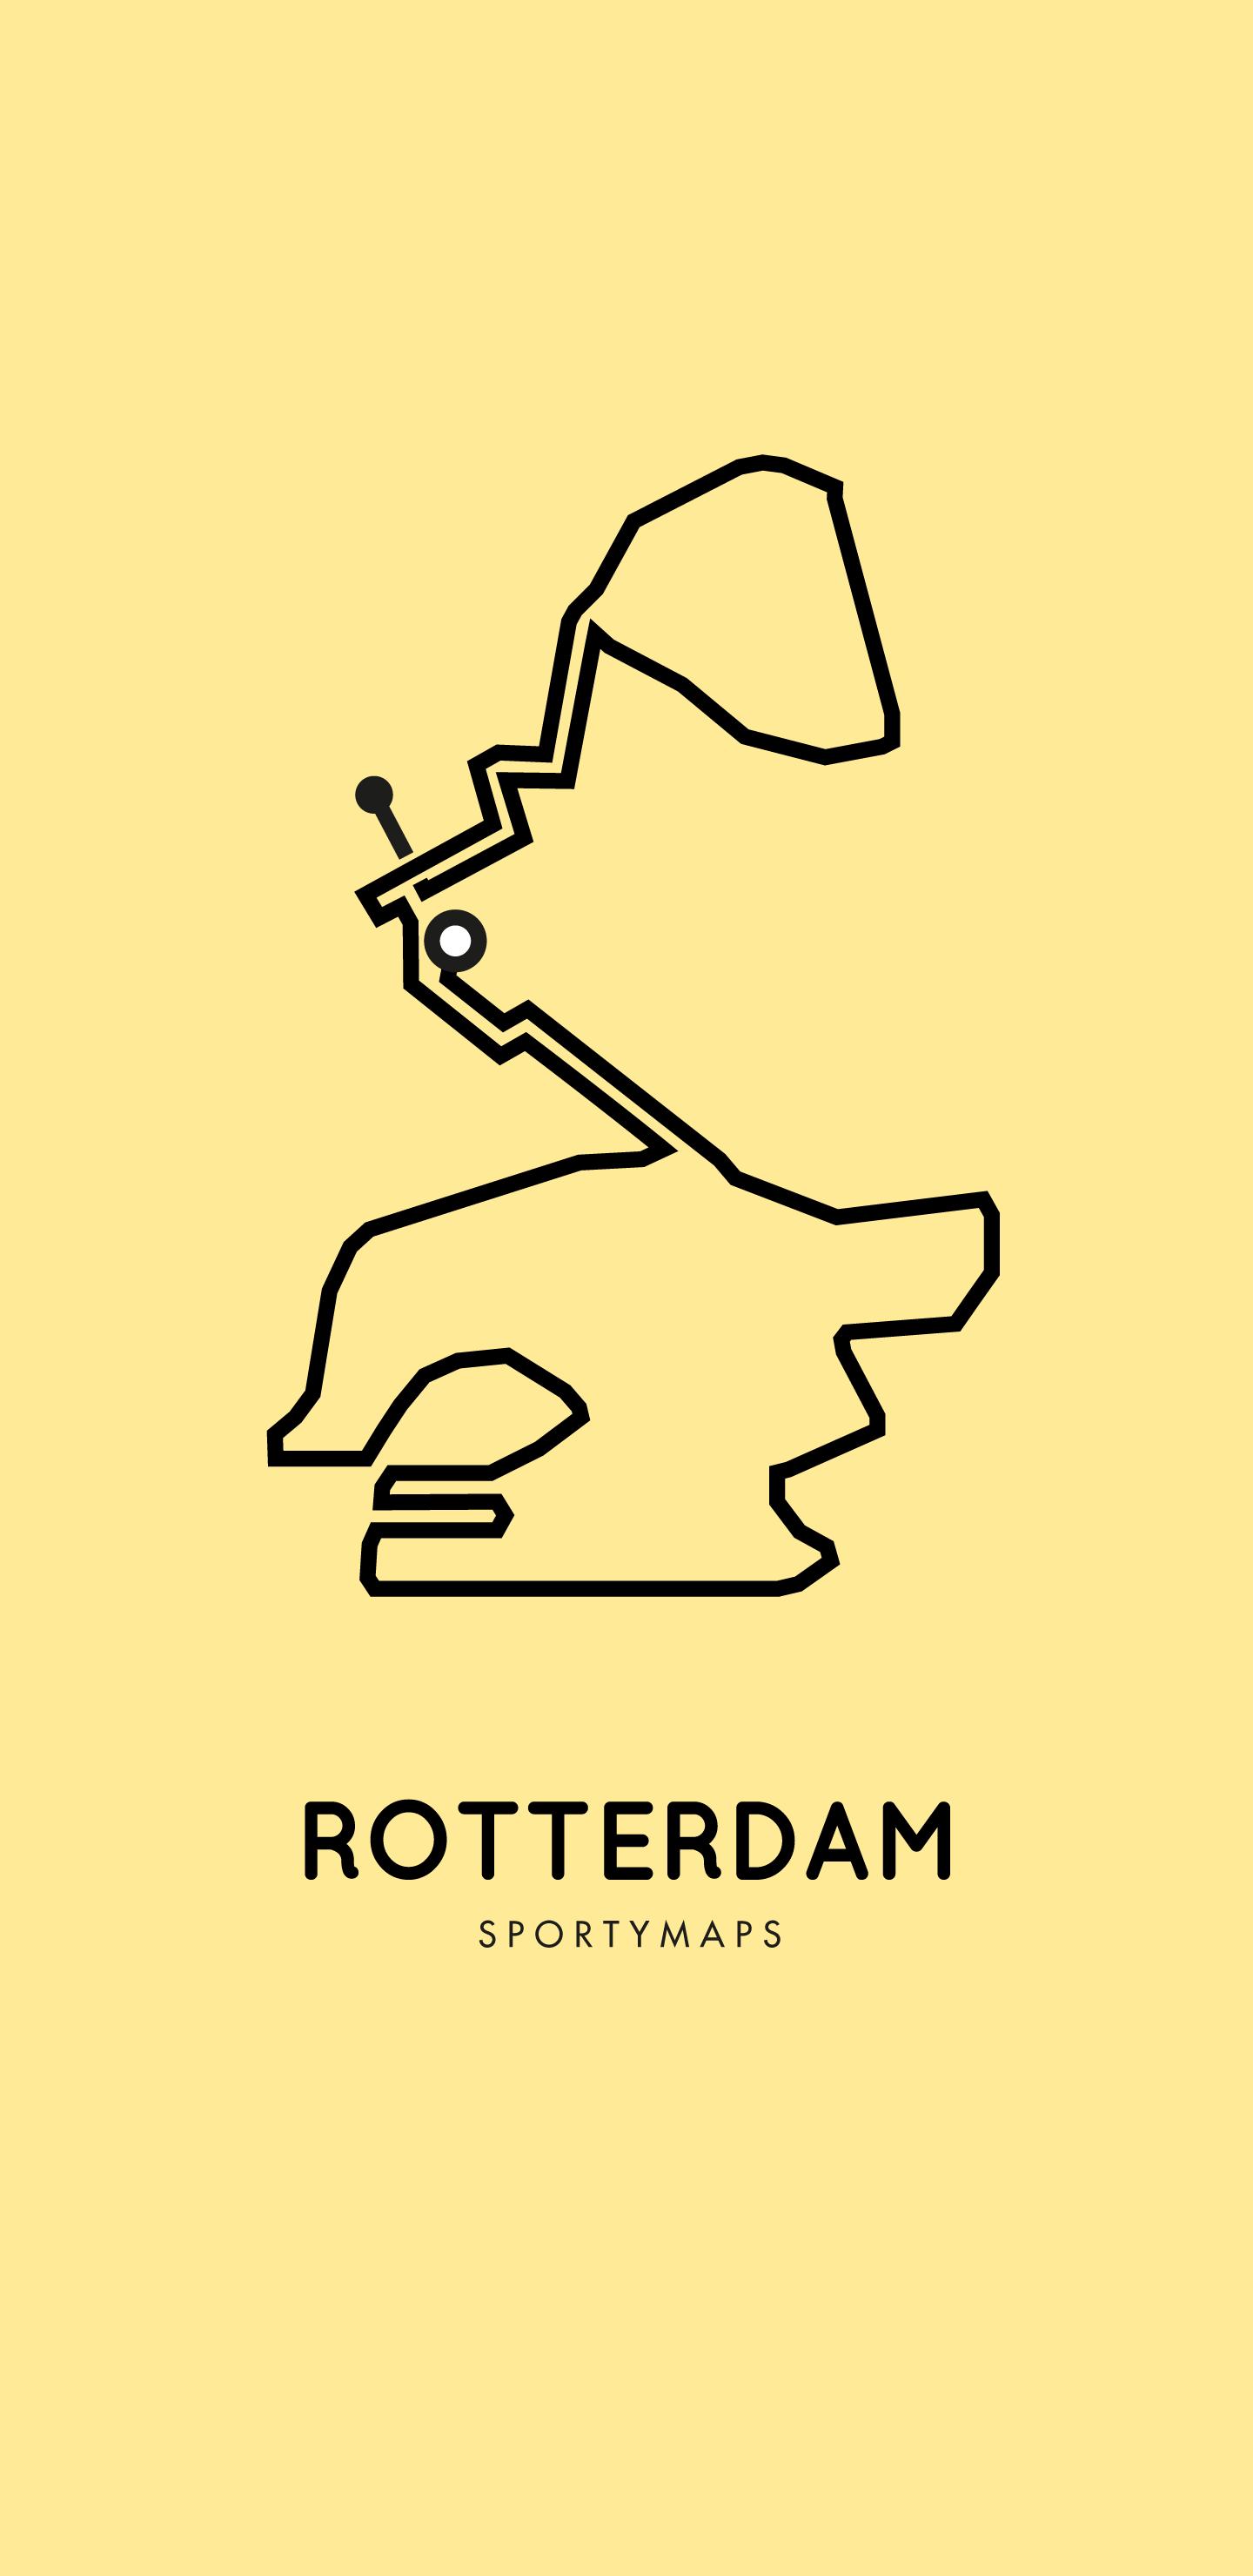 Sportymaps-Rotterdam-marathon-yellow